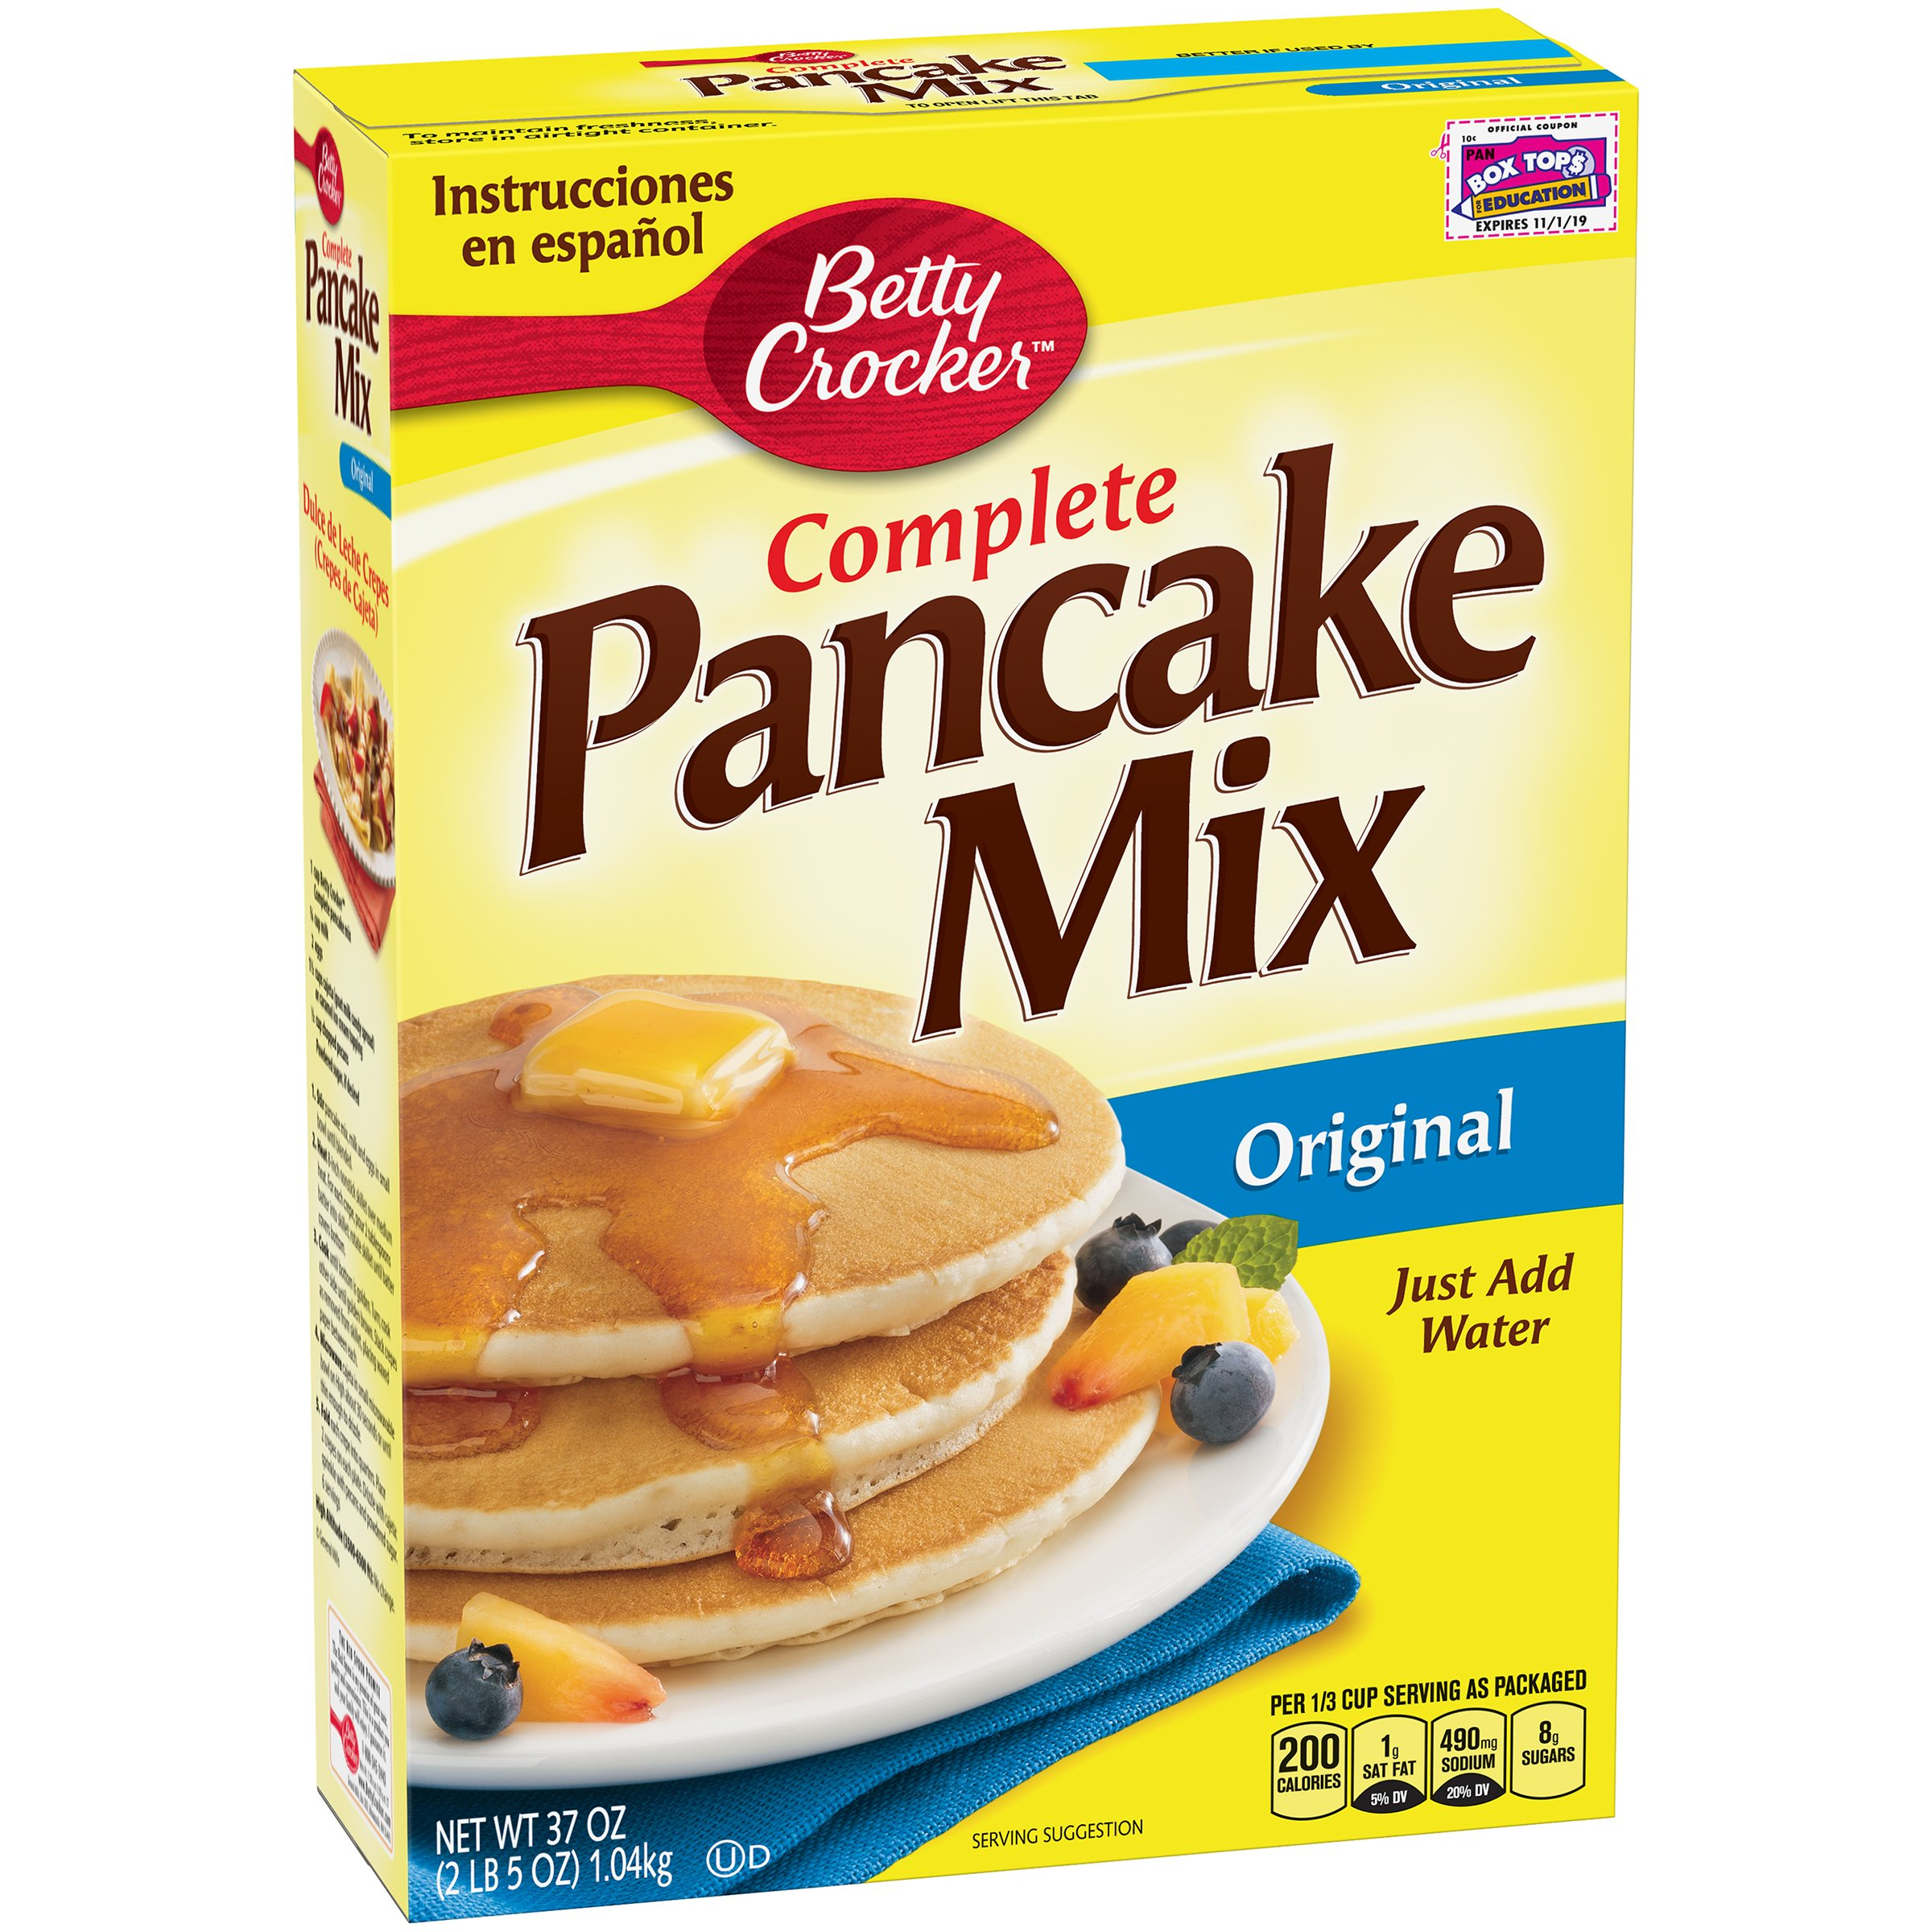 Betty Crocker Complete Pancake Mix, 37 oz by Betty Crocker